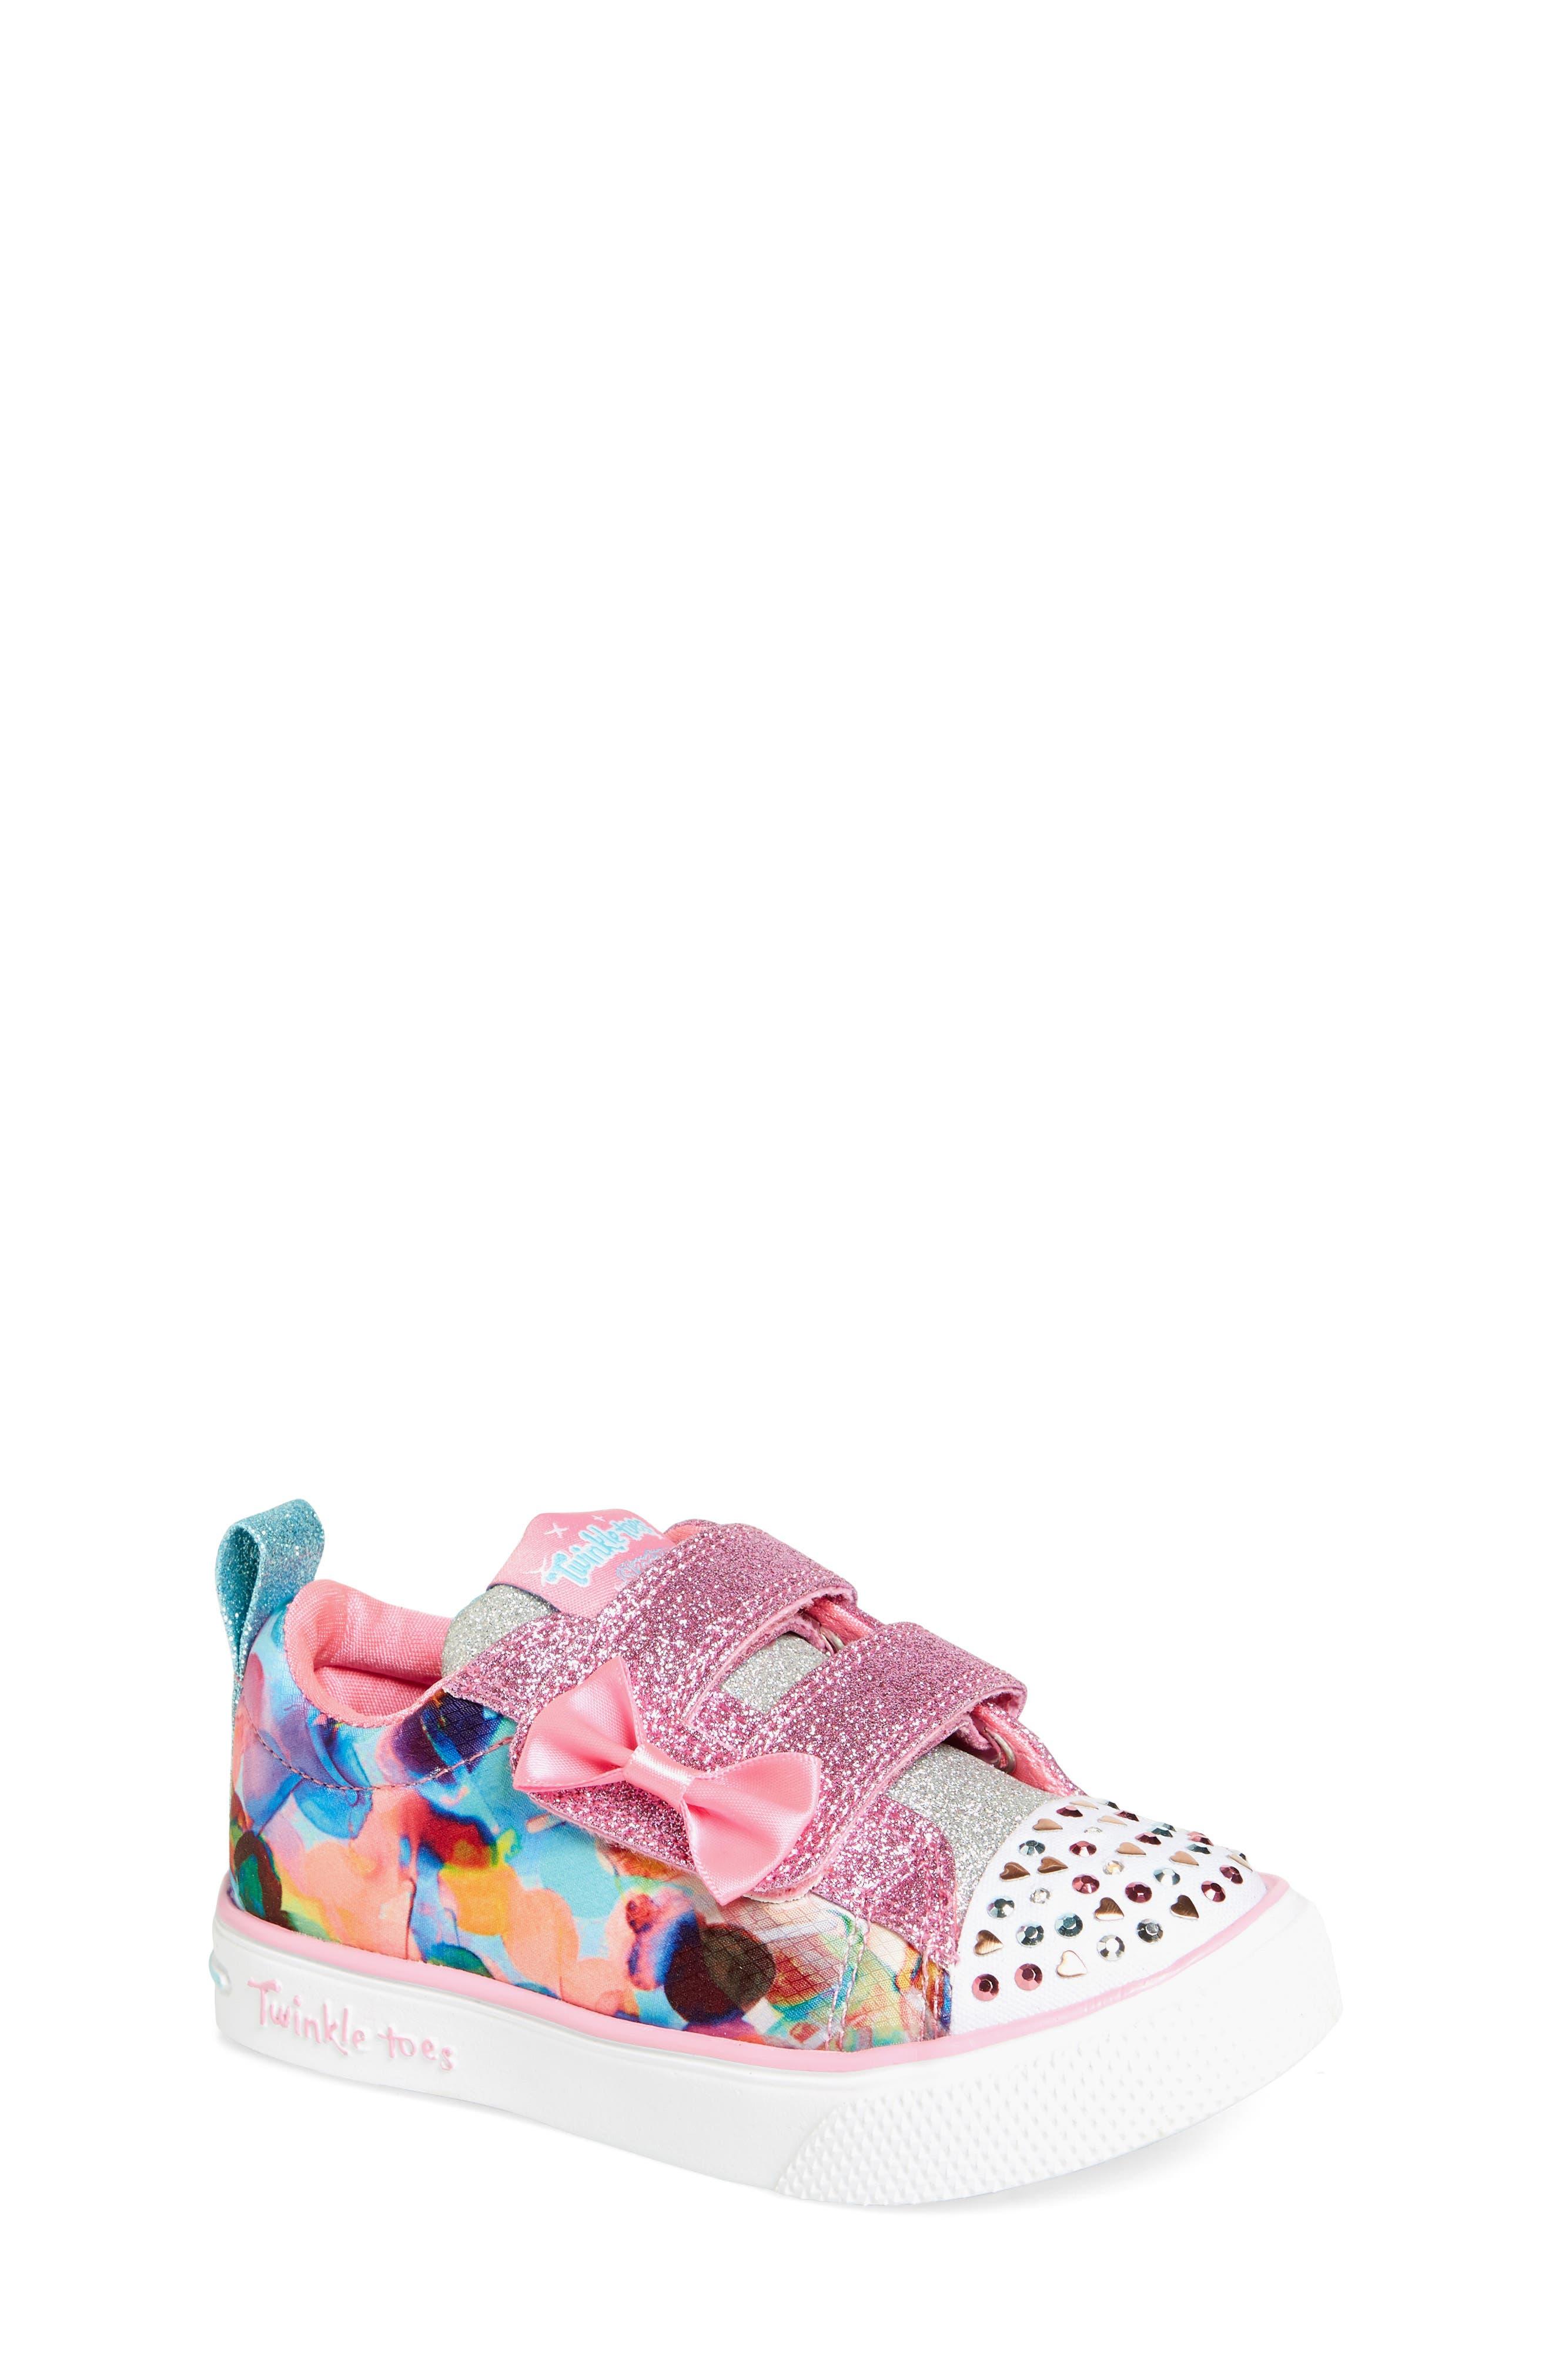 Twinkle Breeze 2.0 Princess Sneaker,                             Main thumbnail 1, color,                             Multi